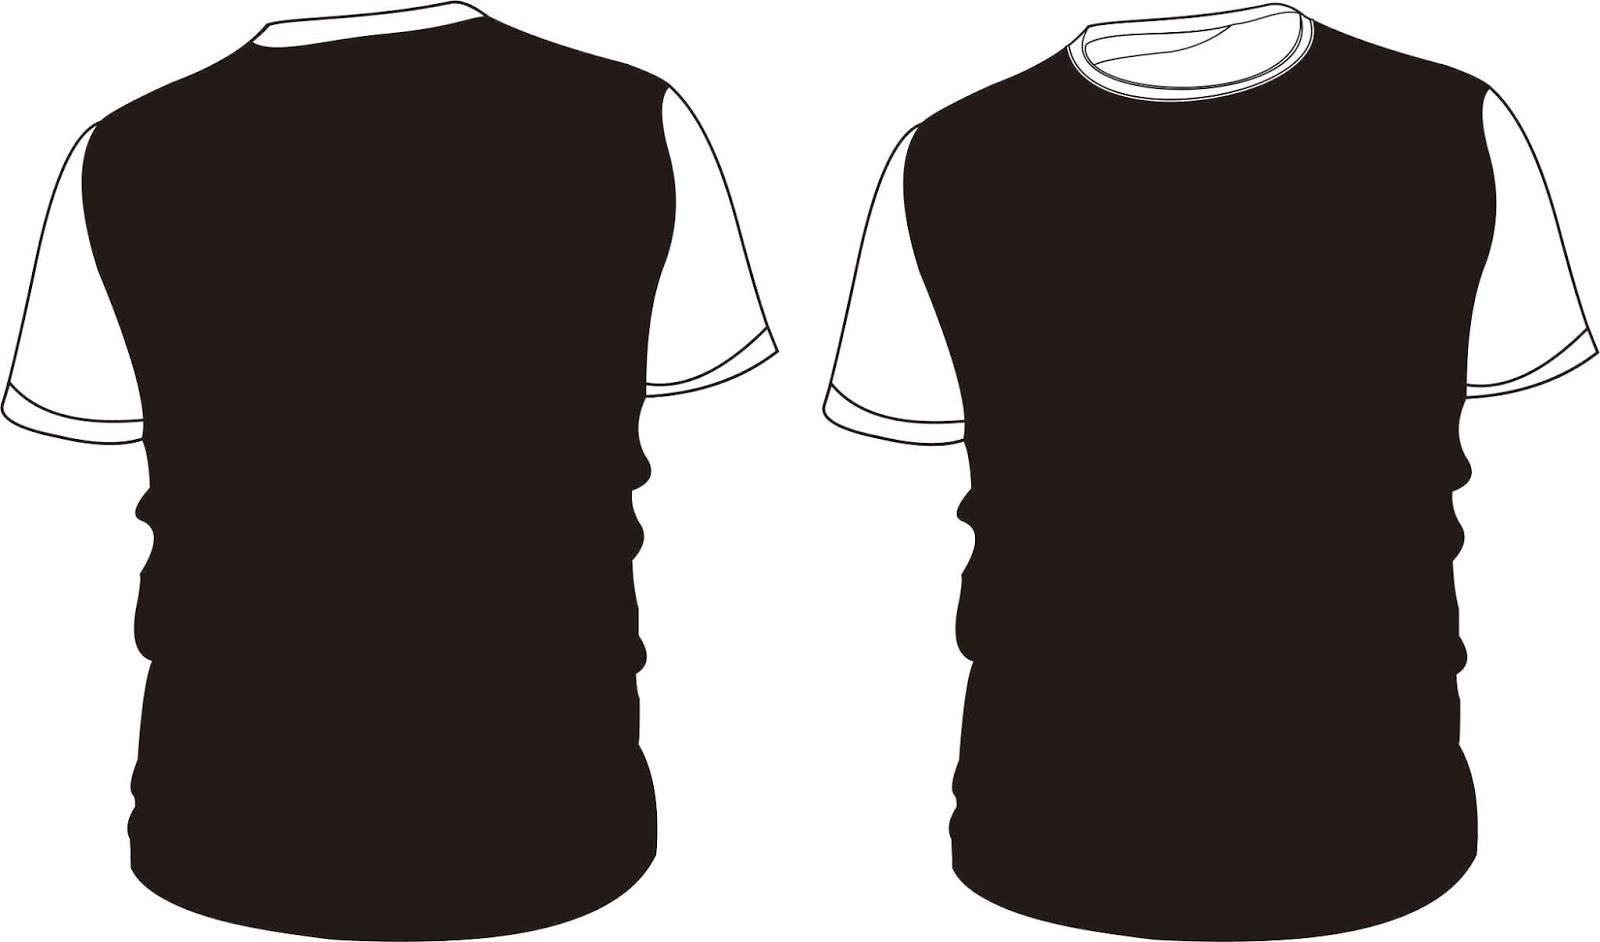 Kaos Polos Hitam Depan Belakang 0856 333 0071 Jasa Konveksi Dan Bordir Terbaik